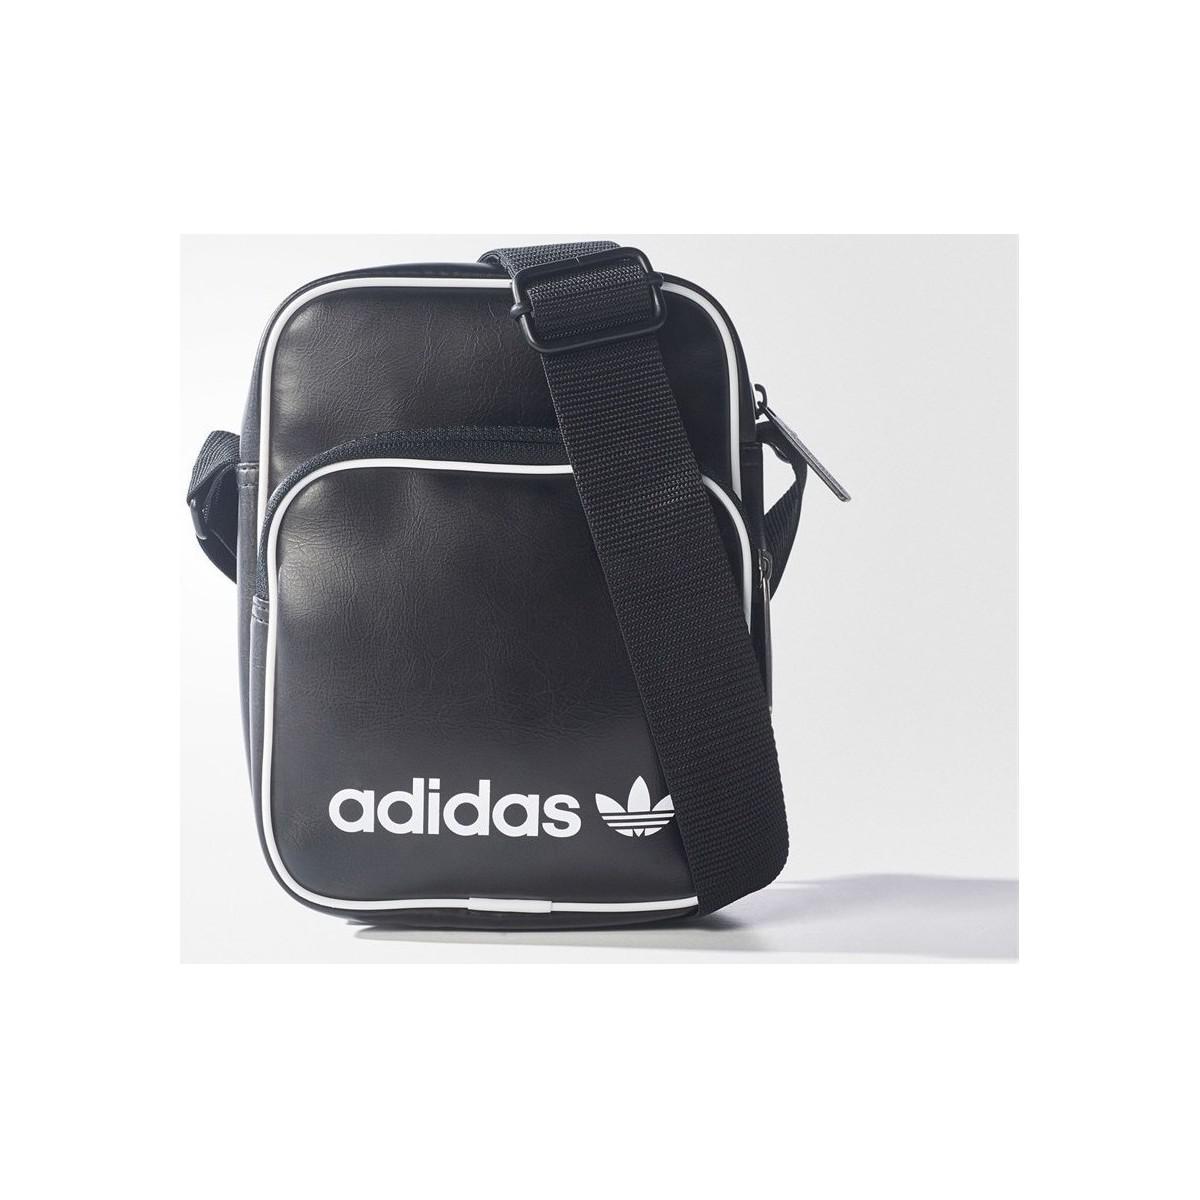 126bc05cbd adidas Originals Mini Vintage Bag Women s Messenger Bag In Black in ...